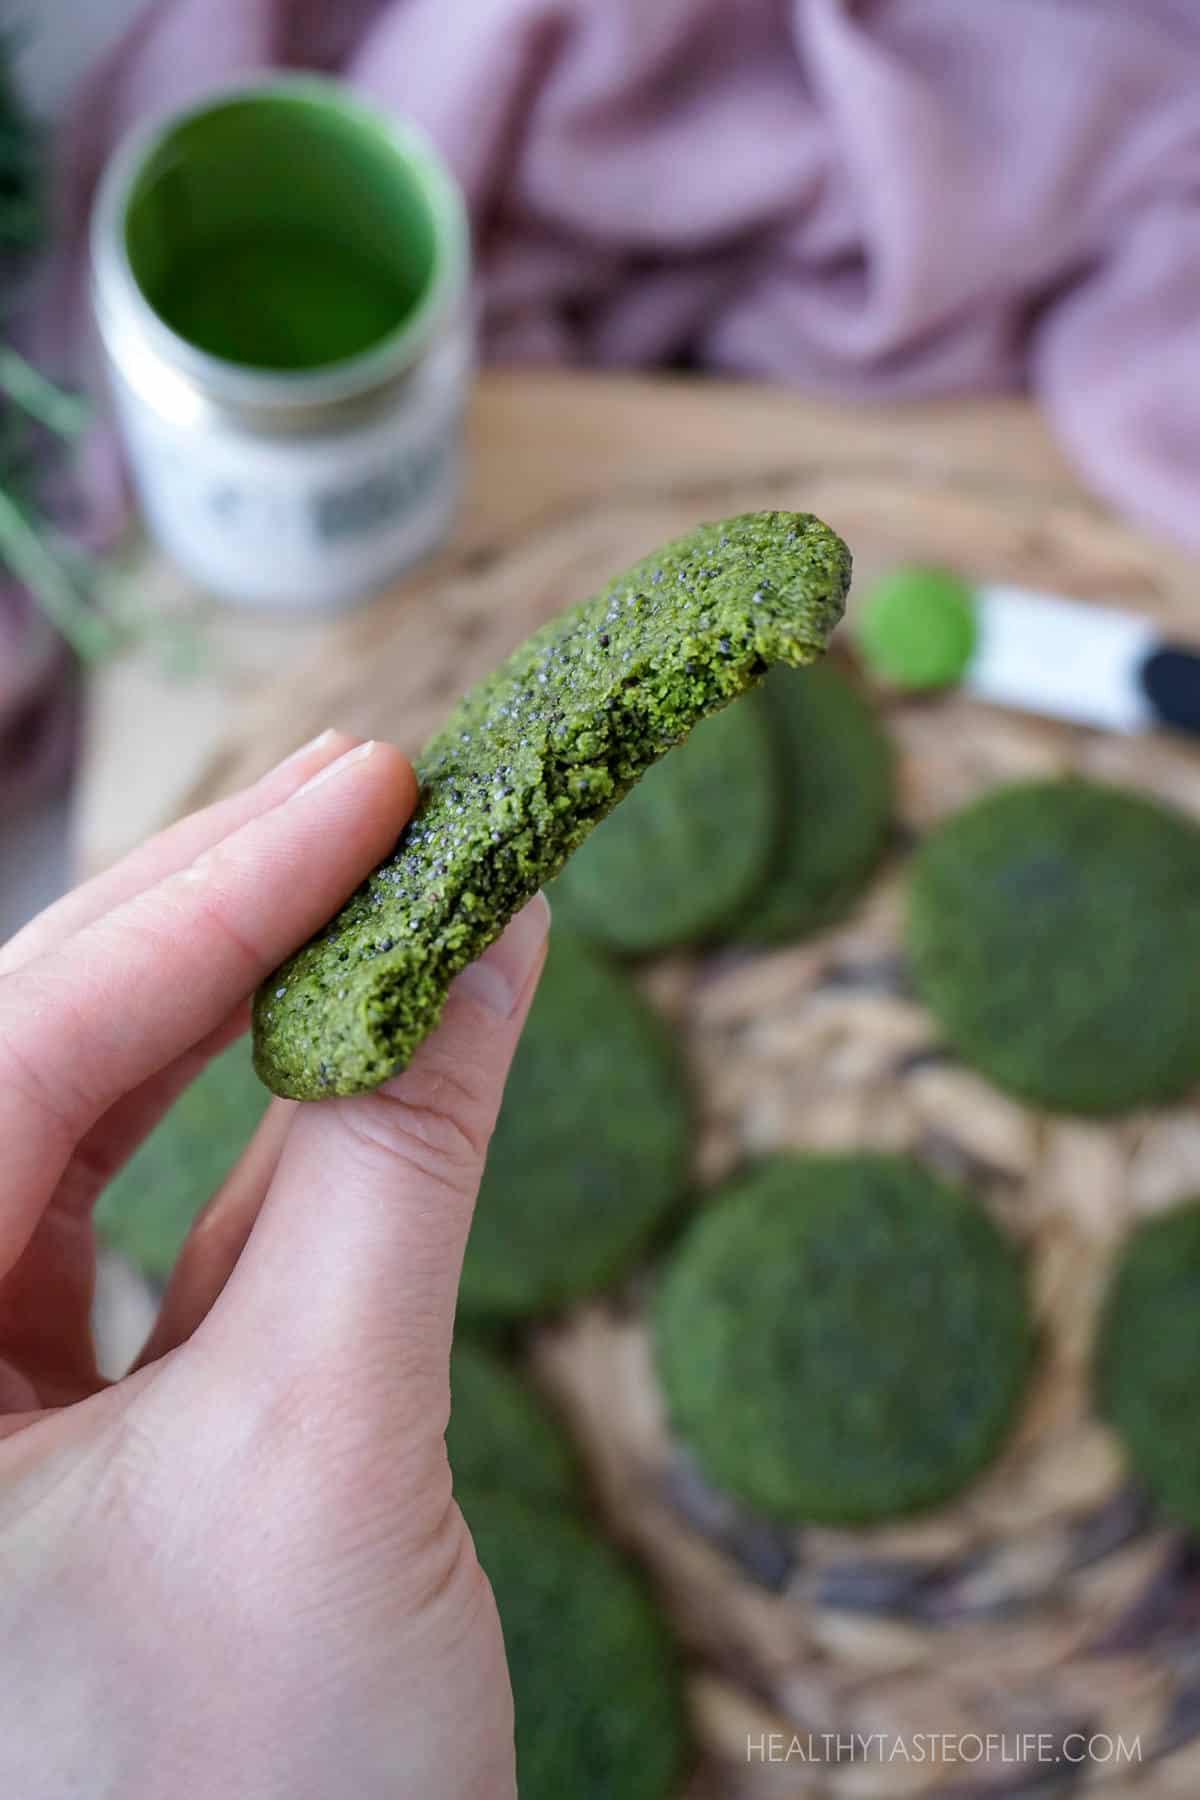 Healthy Matcha Sugar Cookies-  vegan, gluten free, healthy matcha cookies with a nice soft chew. These vegan matcha cookies are made with oatmeal, vegan butter and sweetened with maple sugar #matchacookies #vegancookies